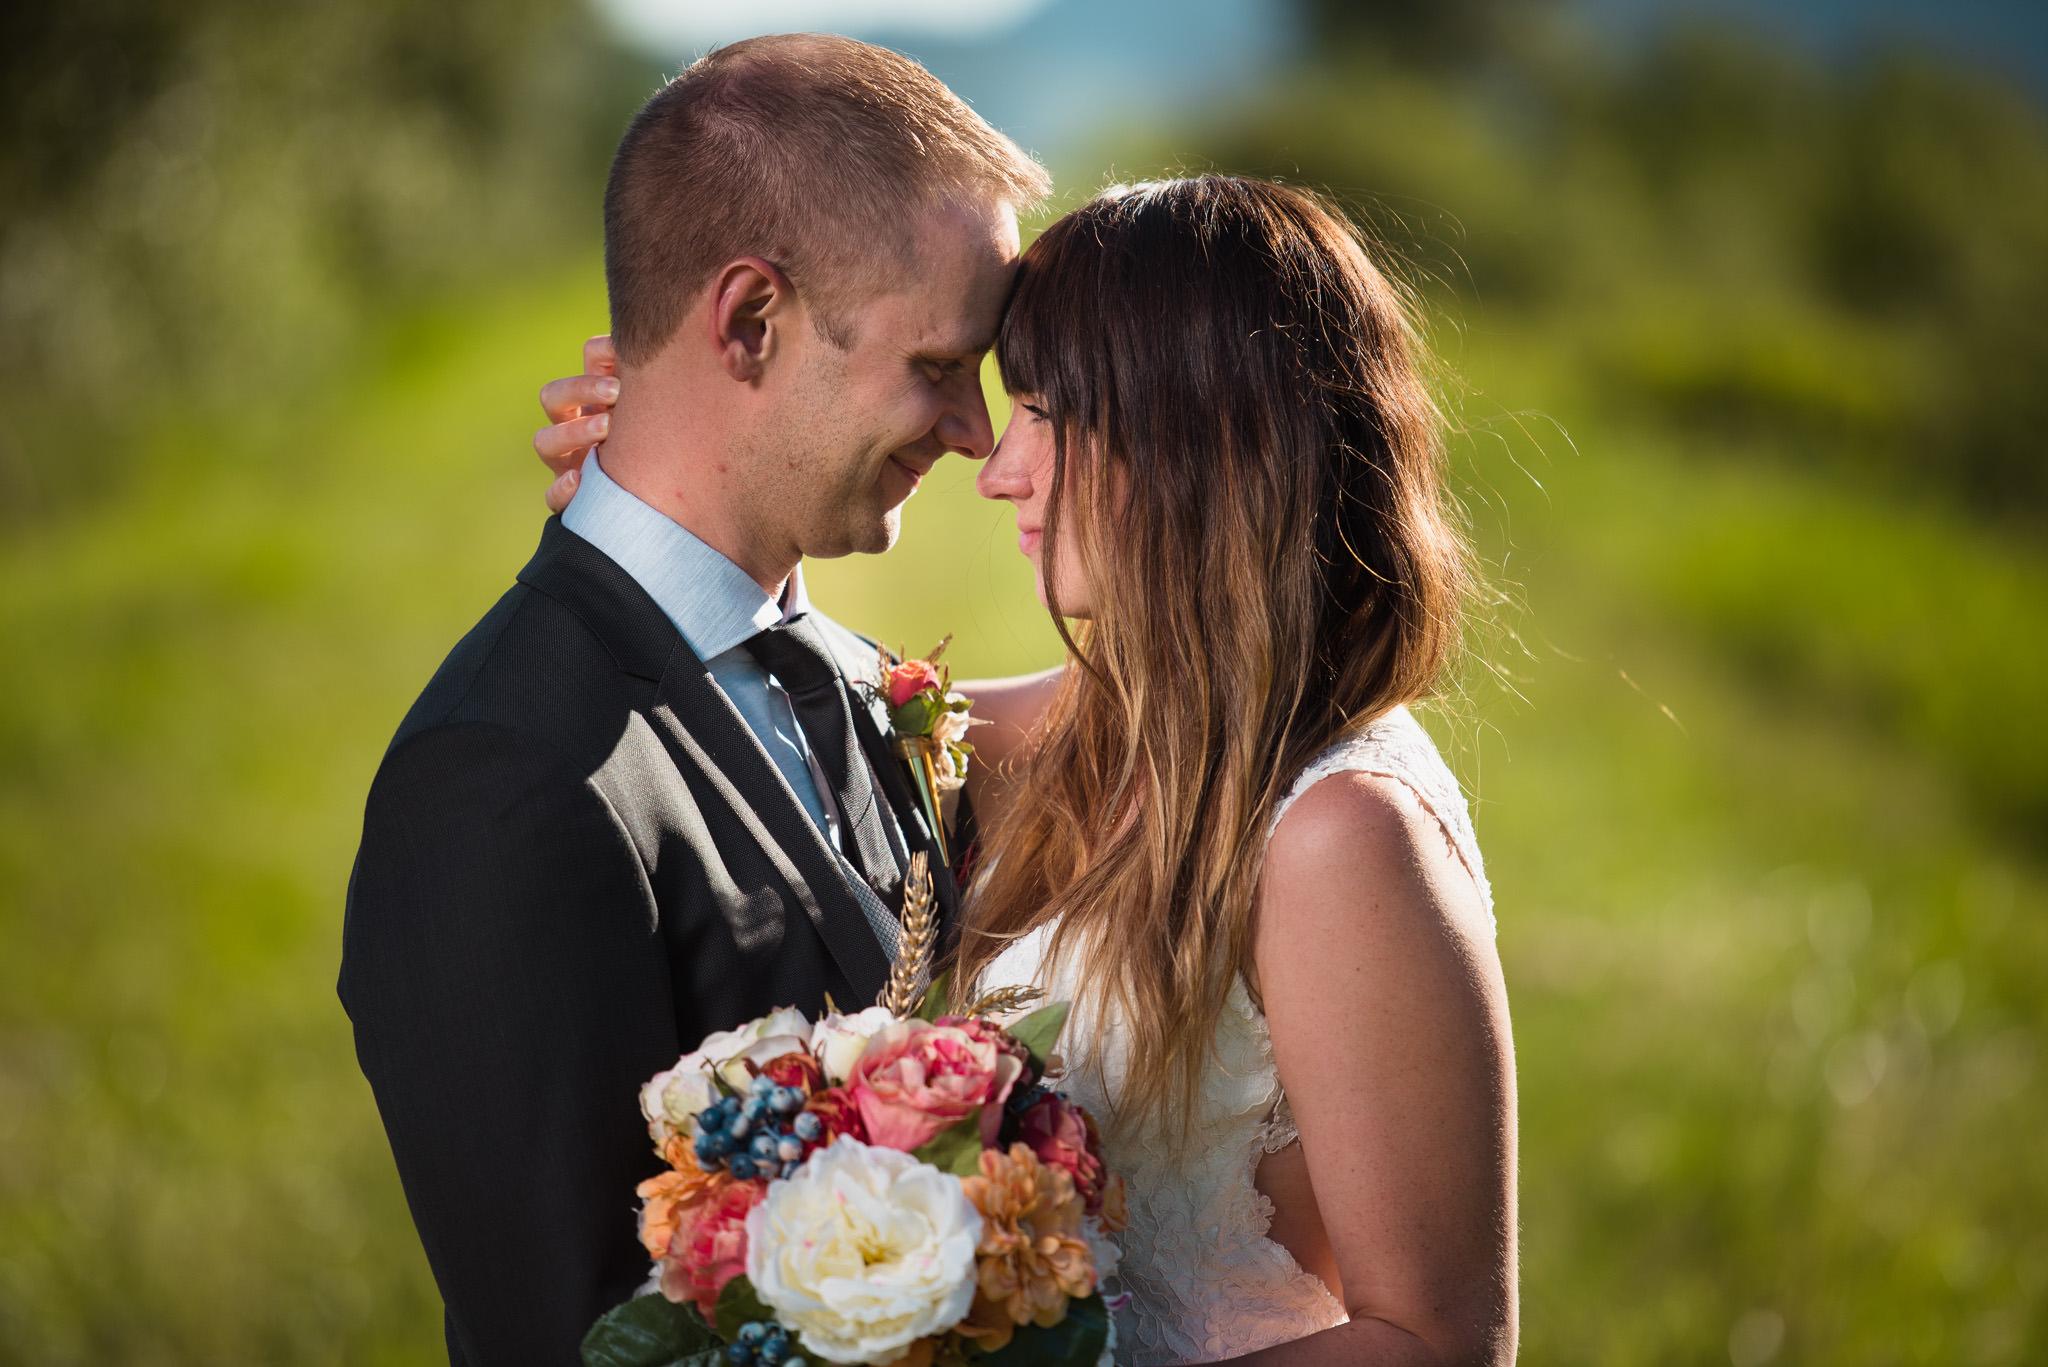 Melanie-Matt-Pitt-Lake-Post-Wedding-Shoot-Victoria-Wedding-Photographers-4.jpg